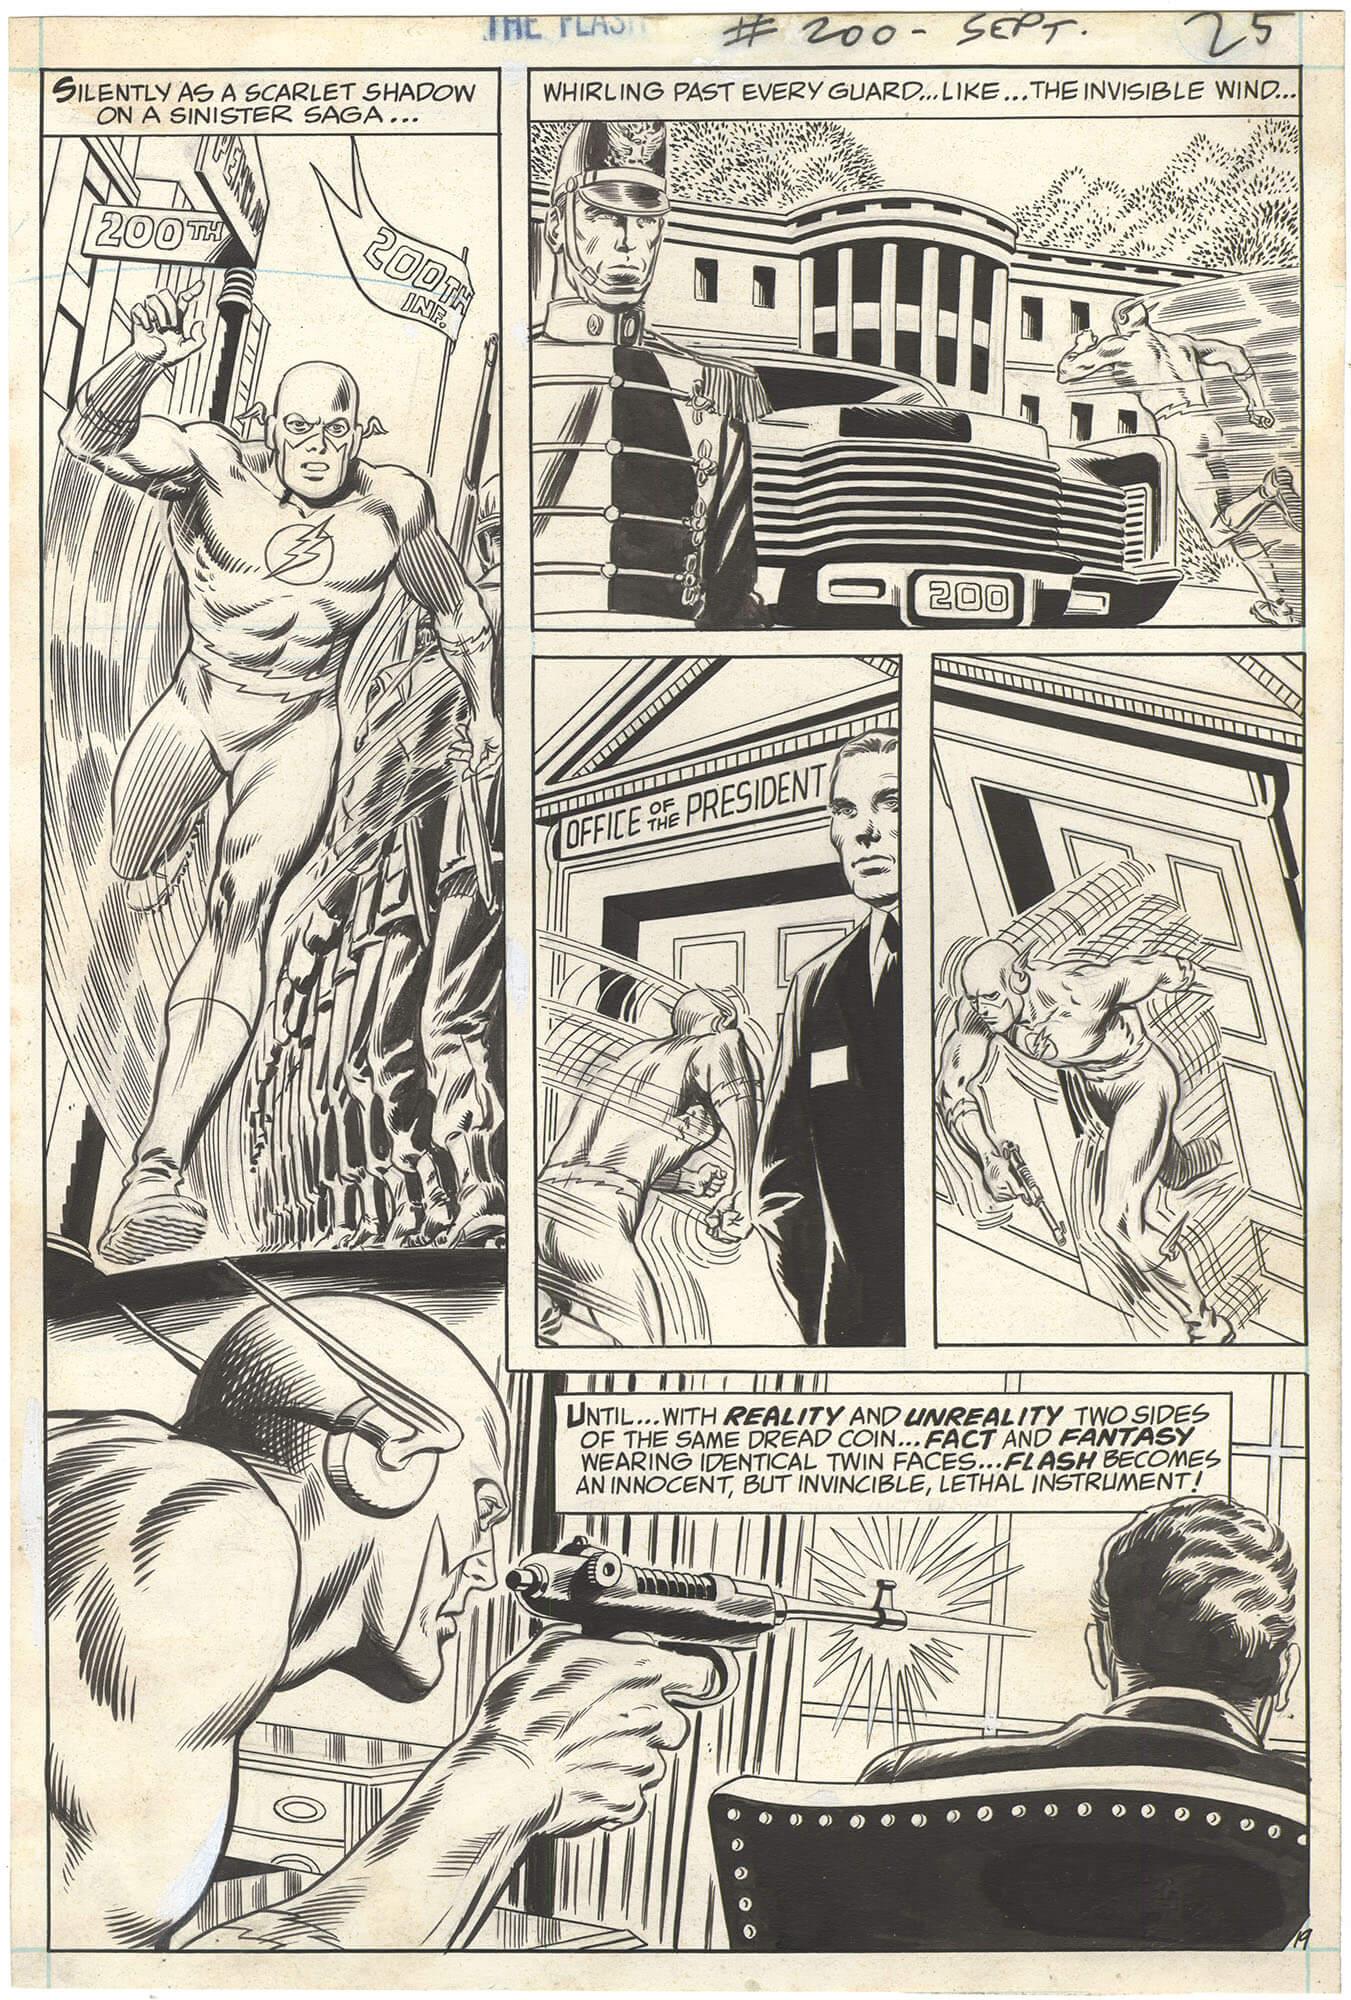 Flash #200 p19 (Bicentennial Issue)